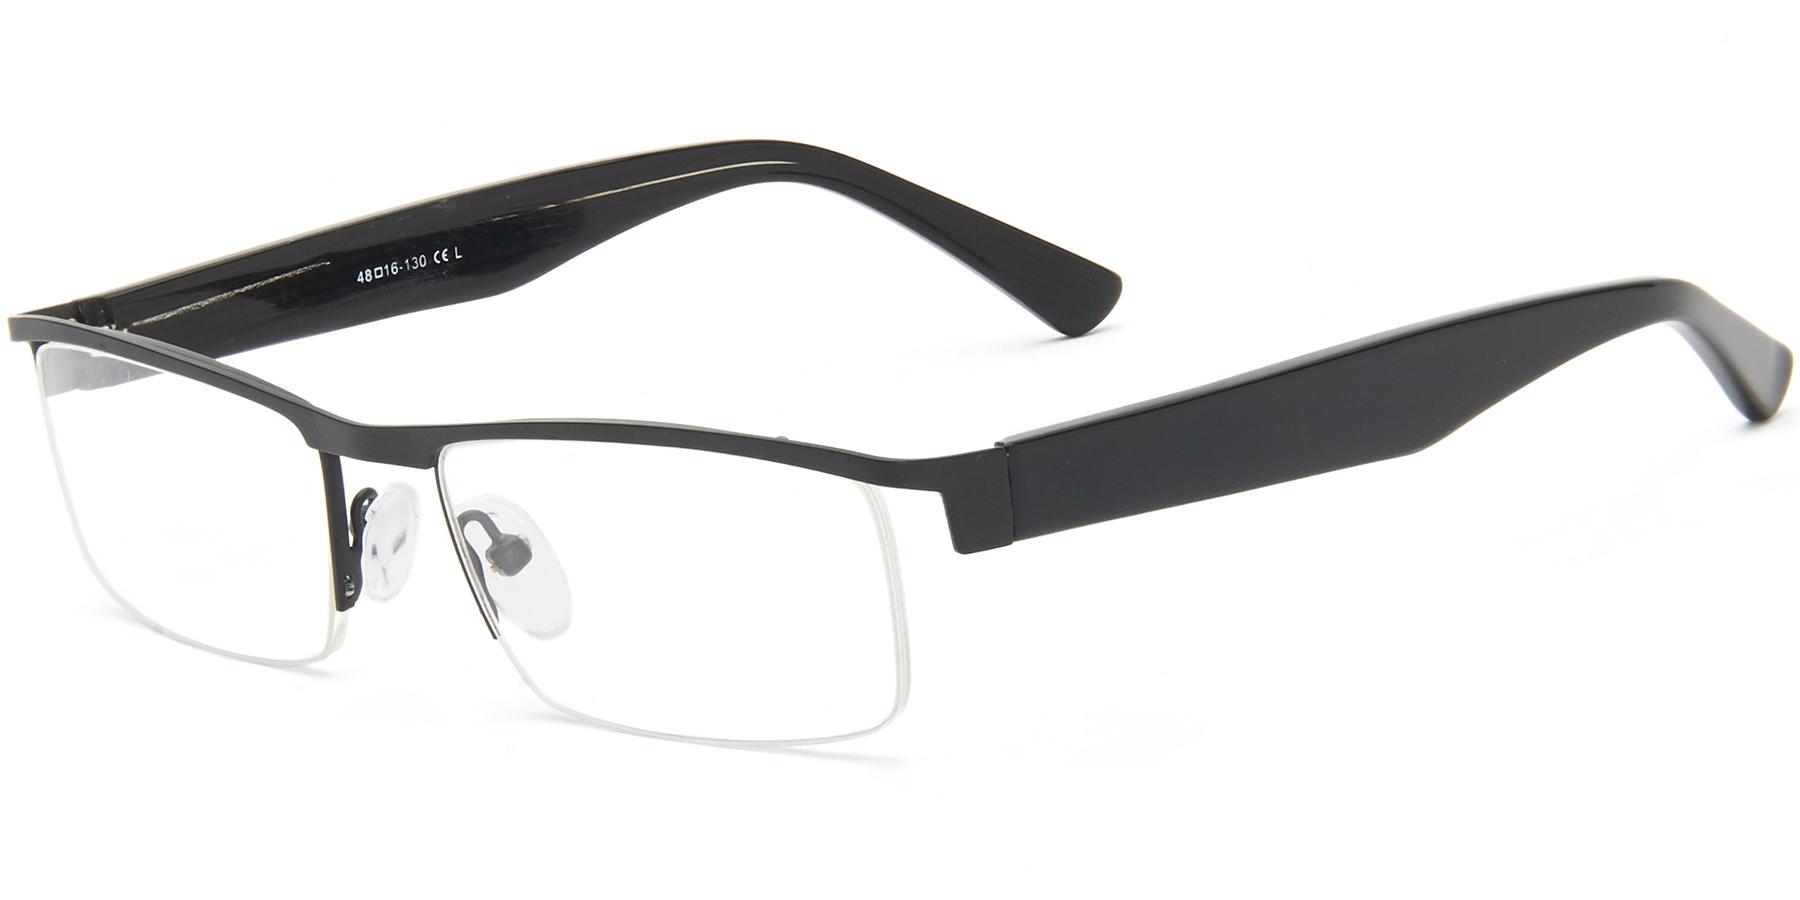 6742c3fda44 DS Collection glasses M388